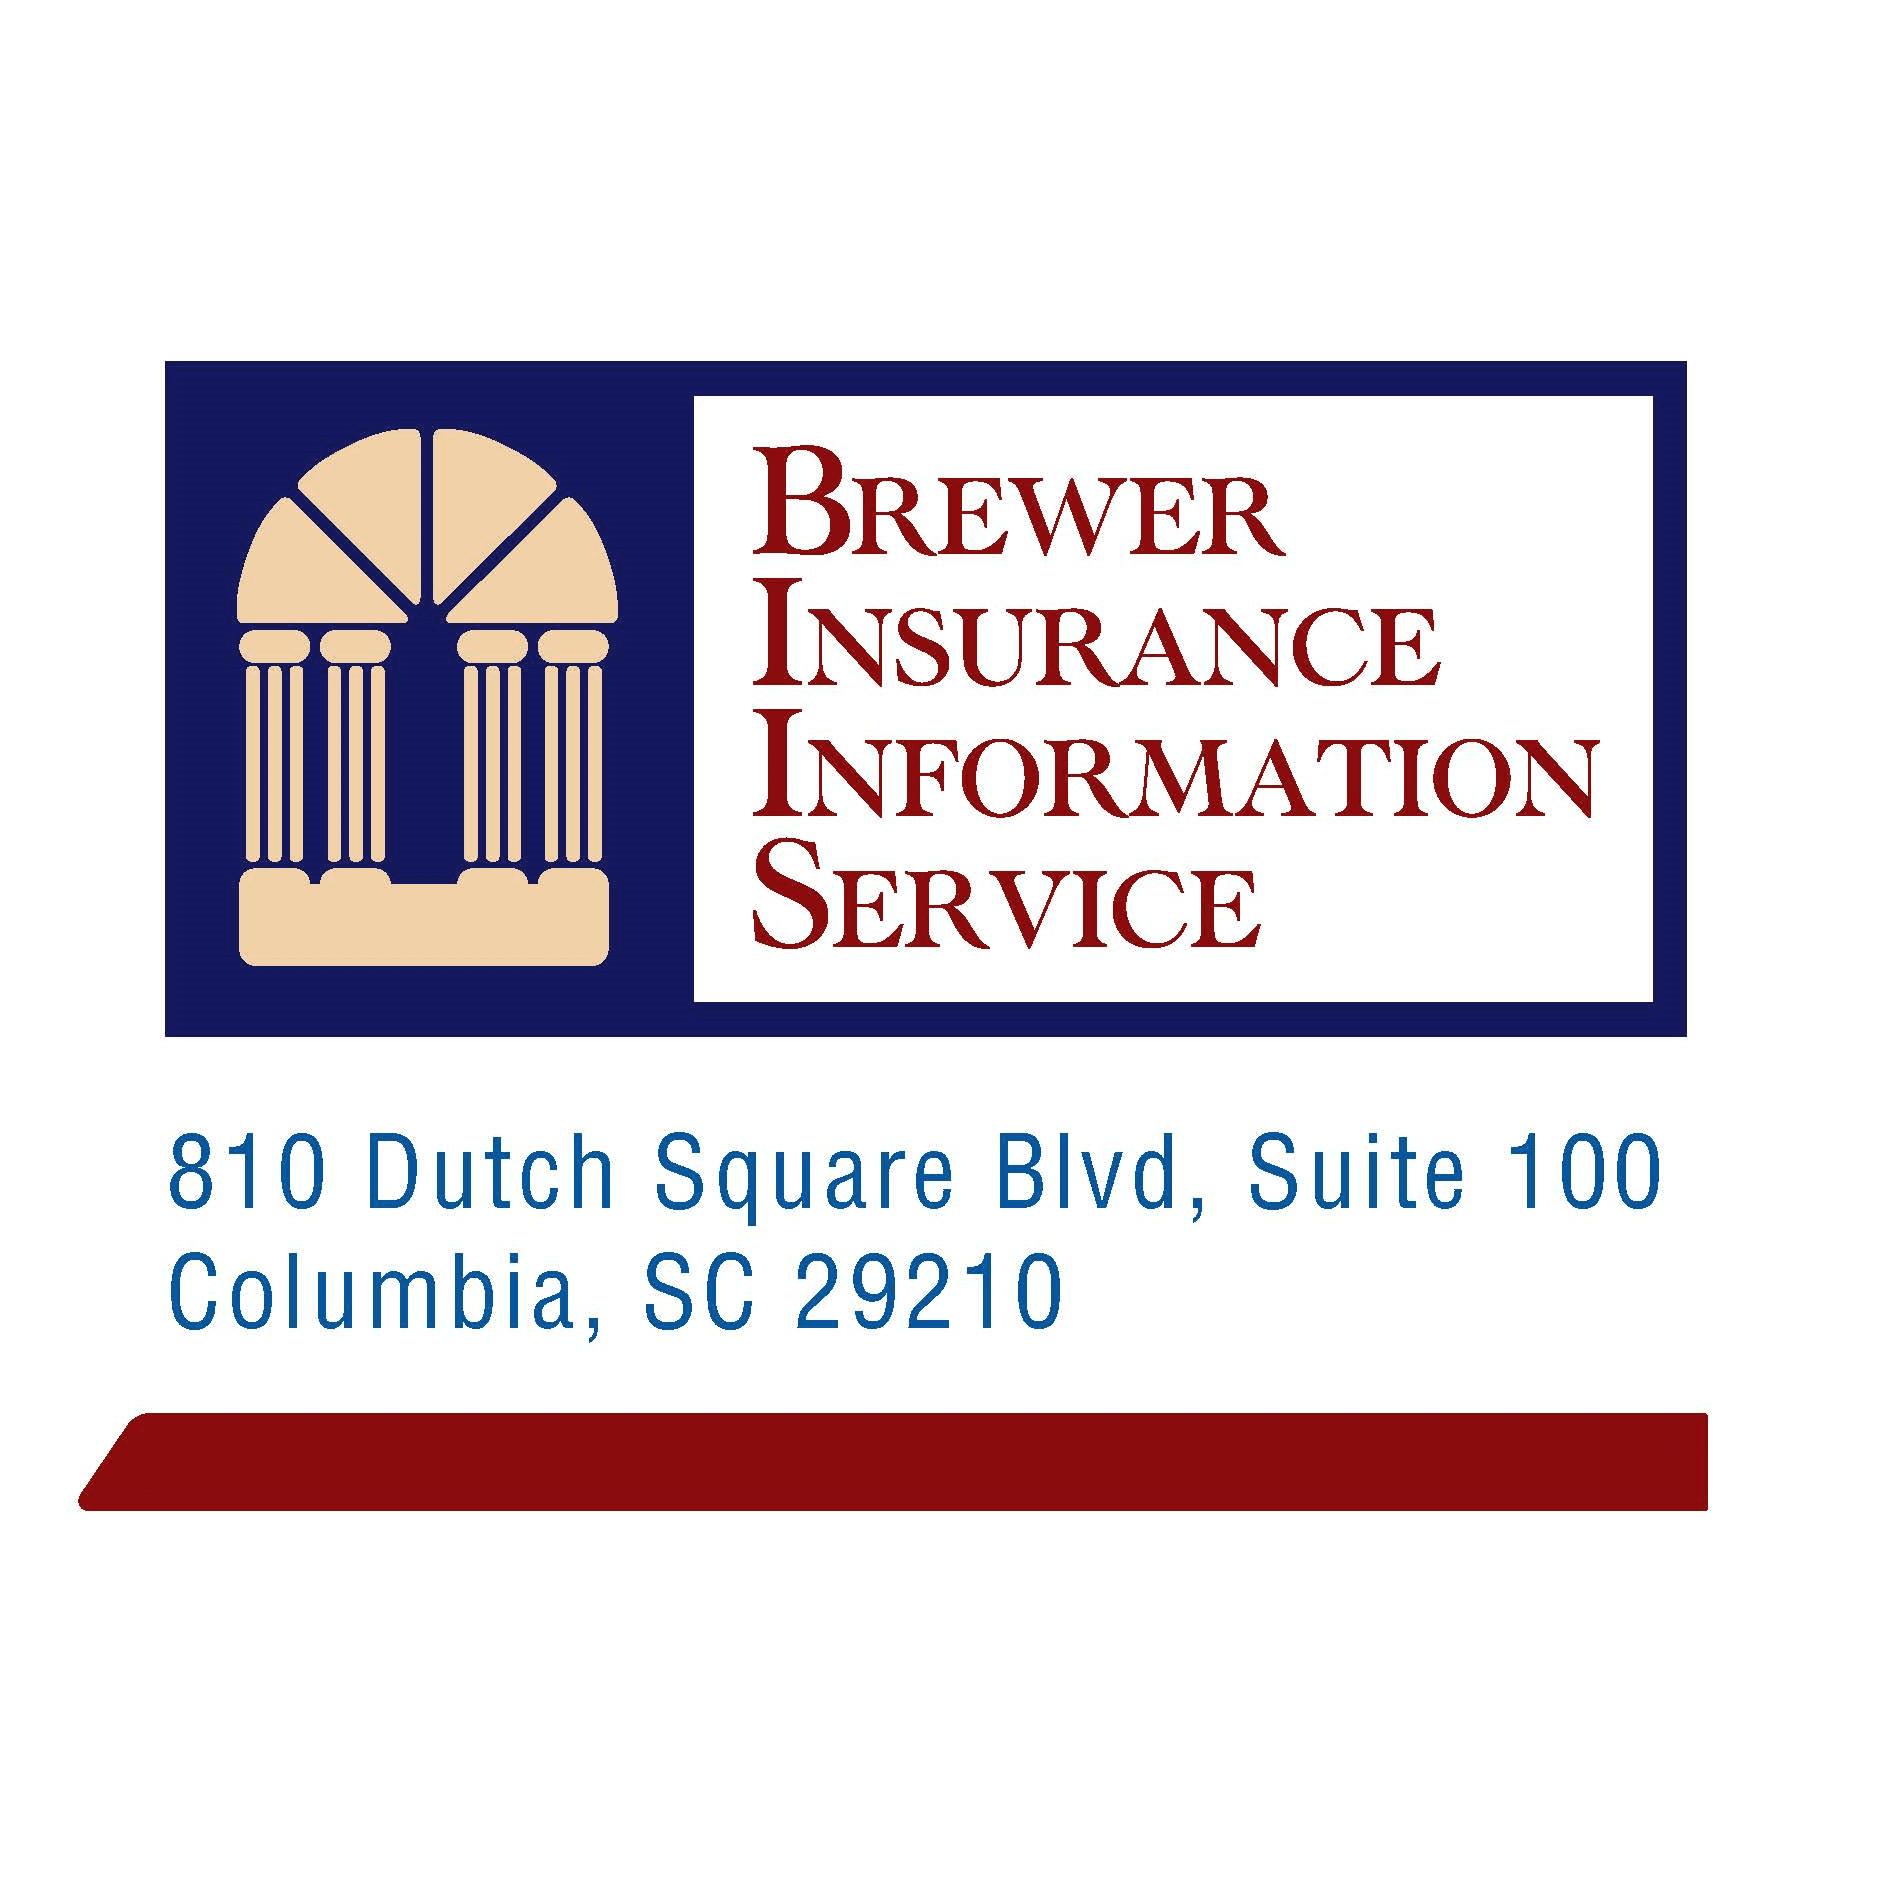 Brewer Insurance Information Service